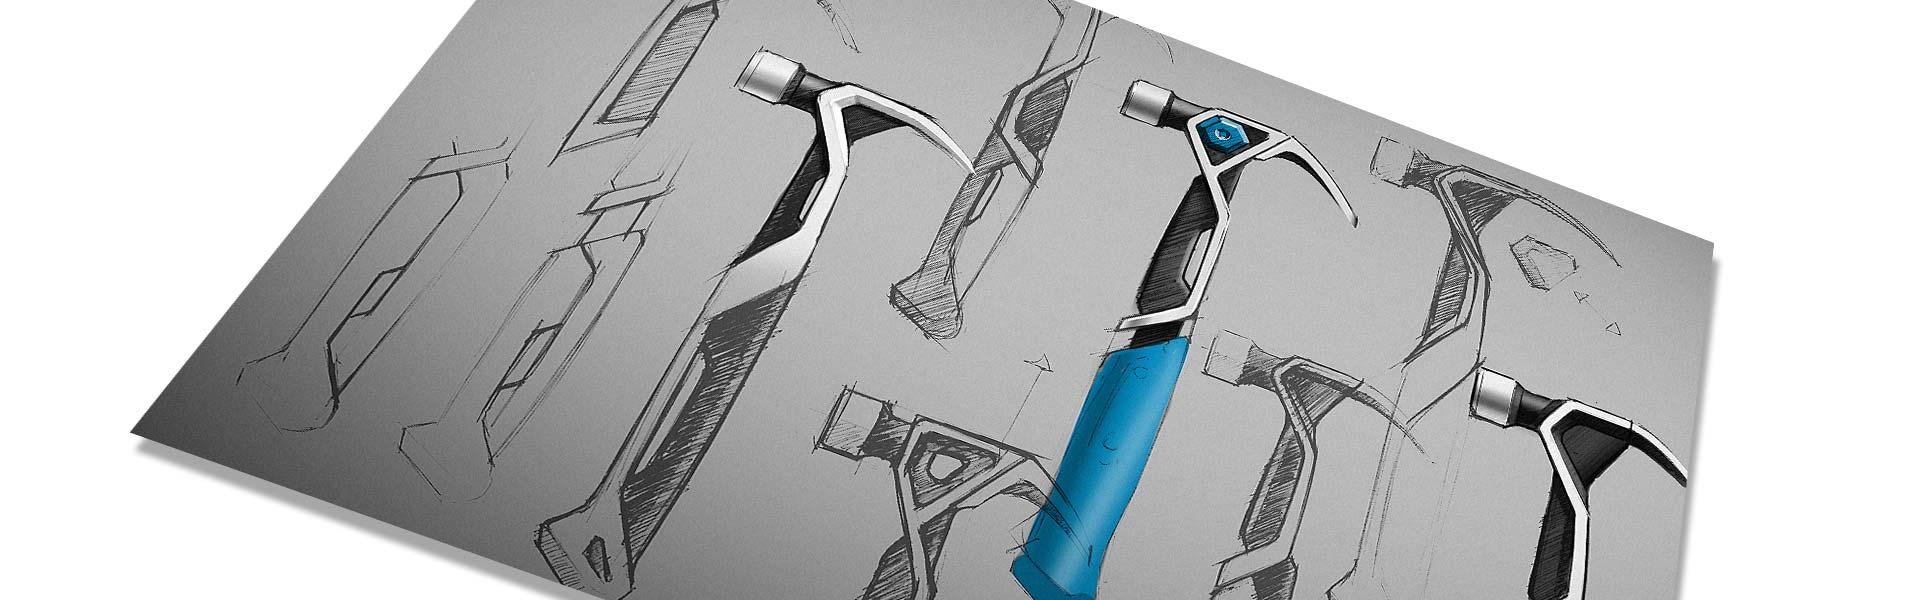 Hammer Concept 1